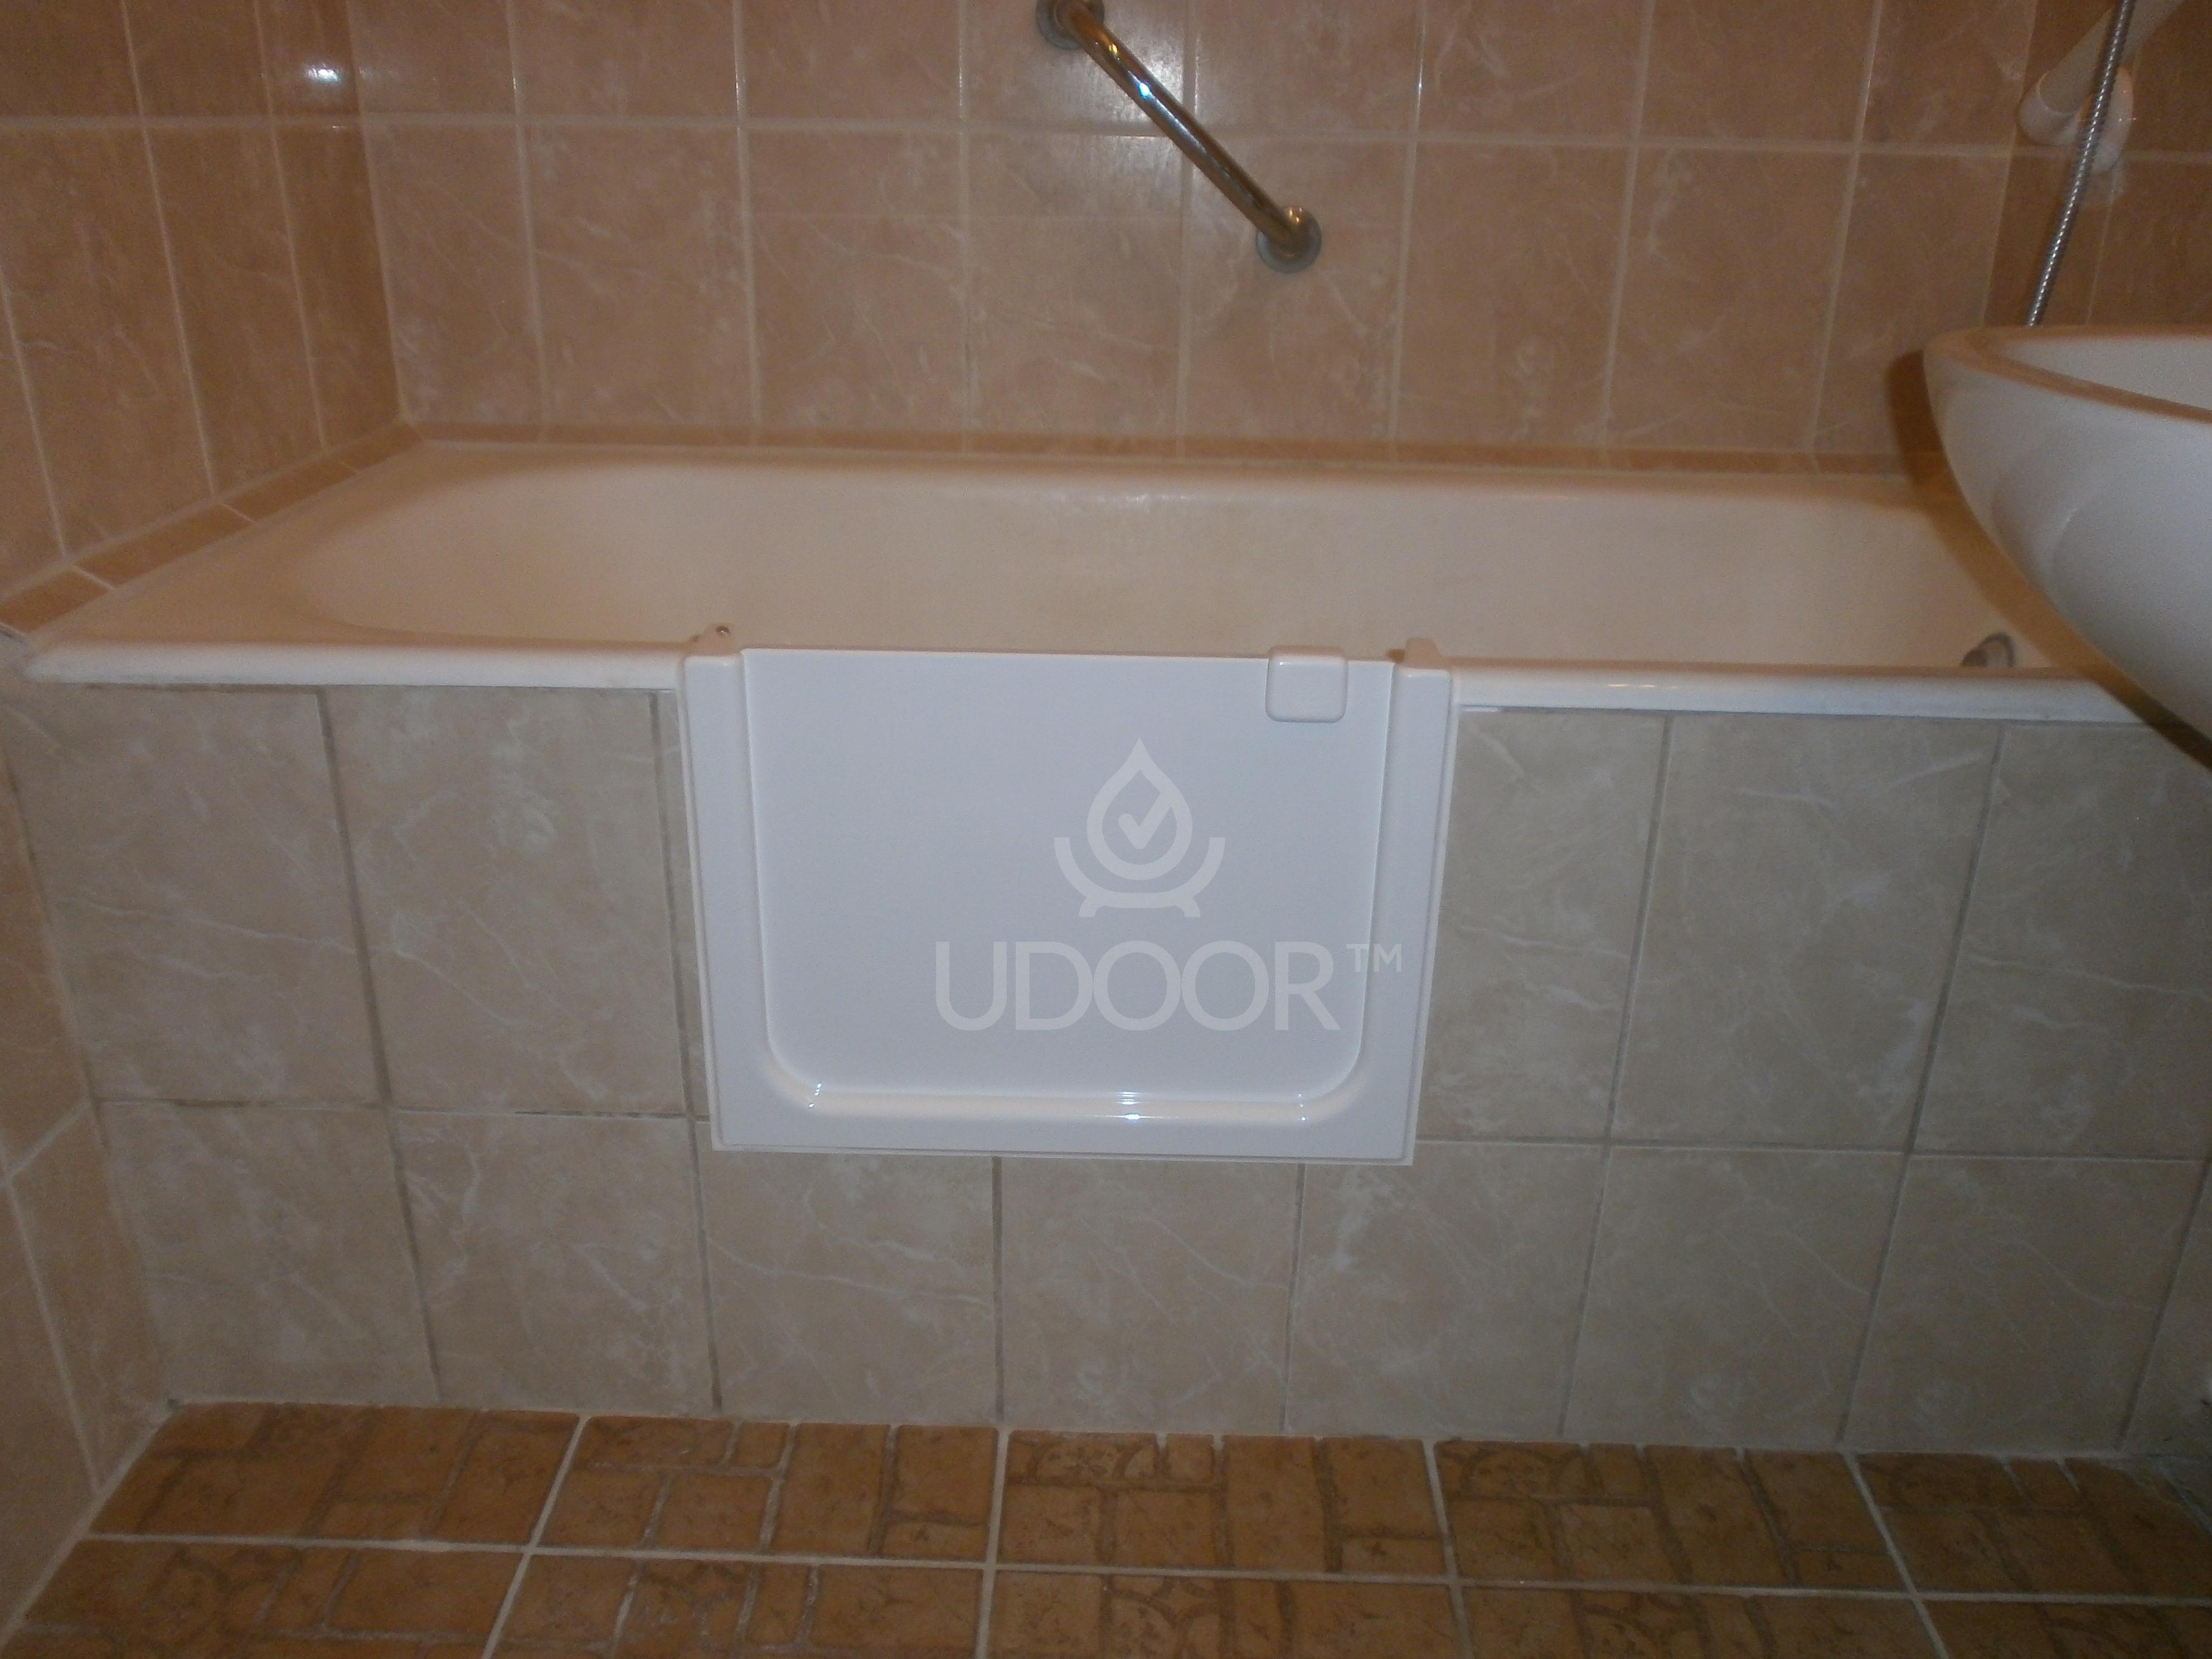 Cast iron bathtubs with brick wall - UDOOR - Bathtub door